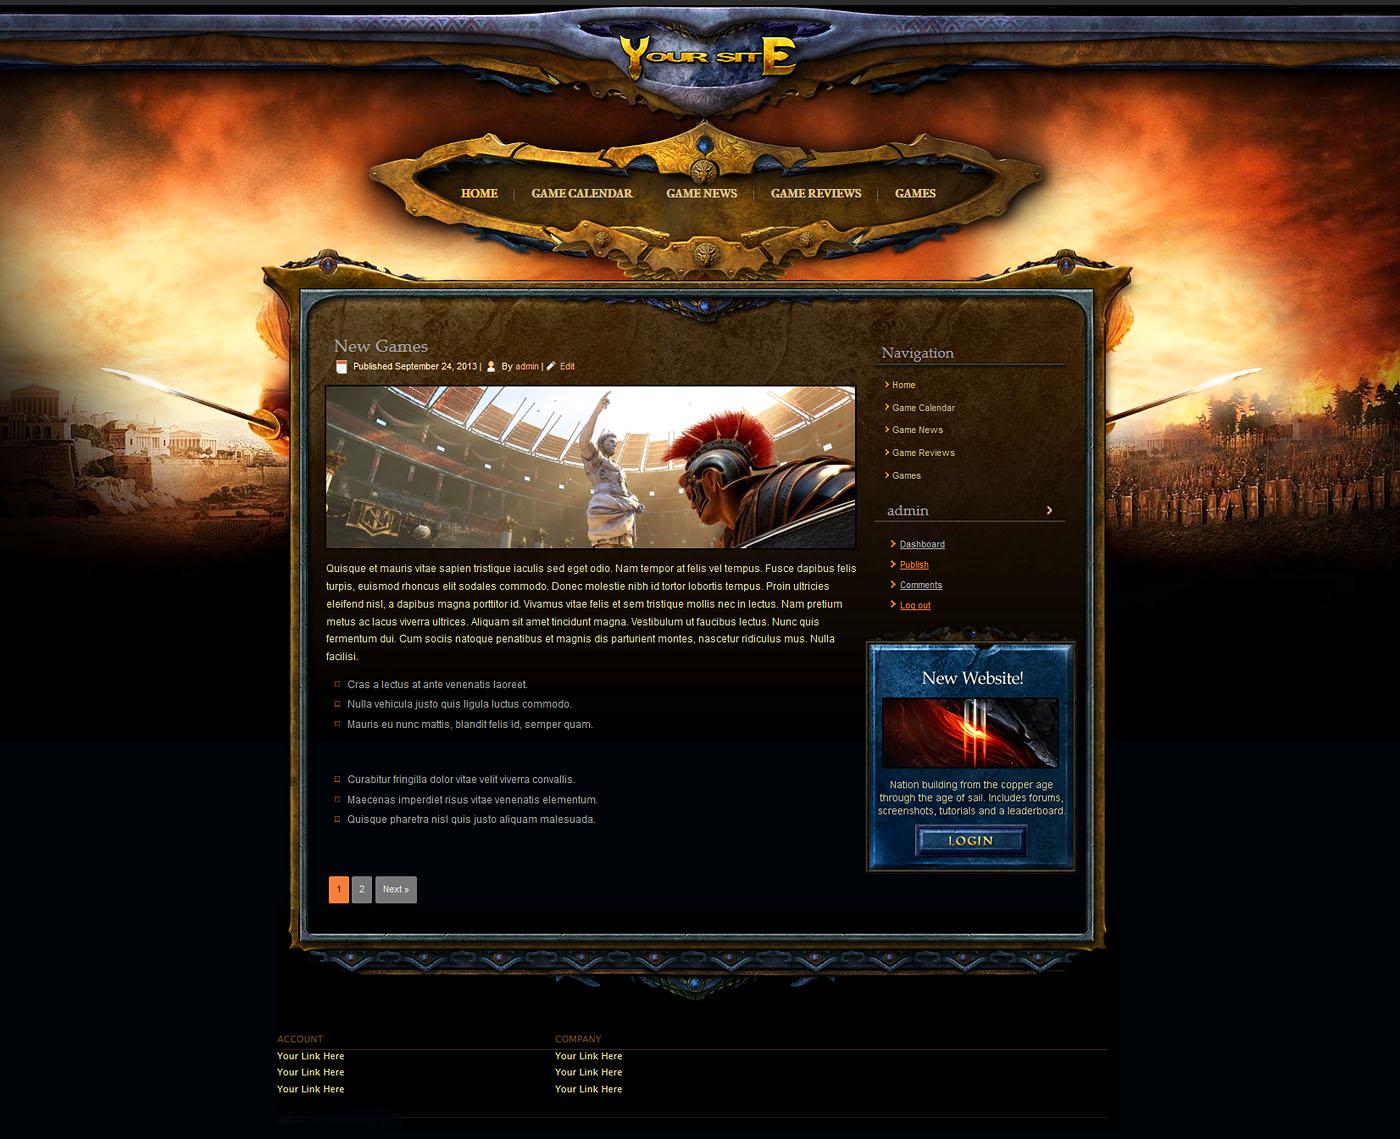 Gaming Website Template WordPress